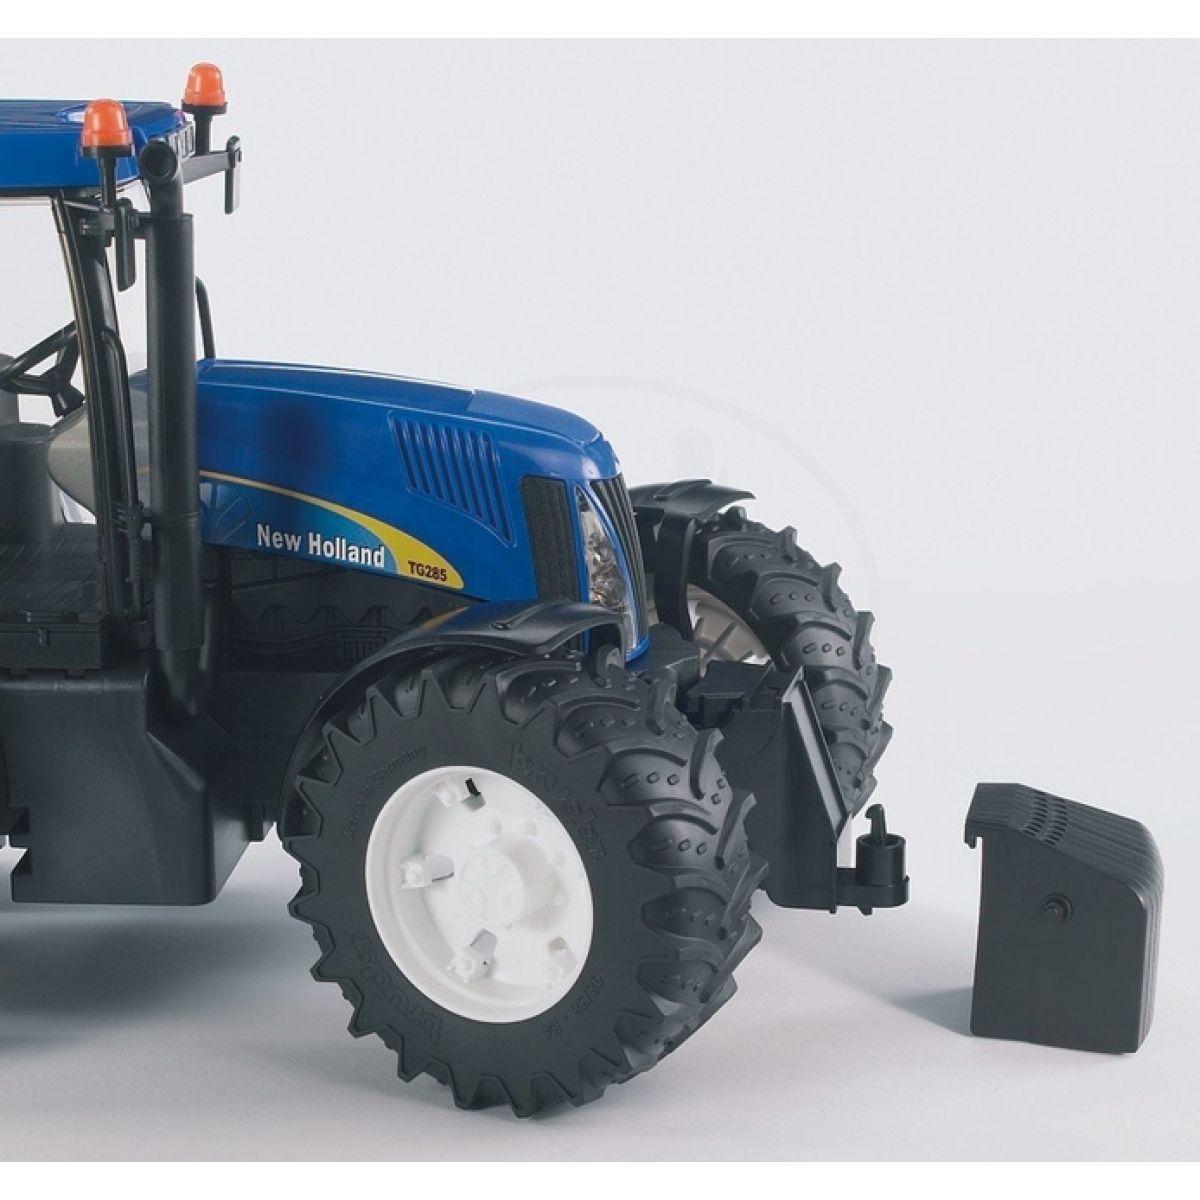 Bruder traktor new holland tg kids